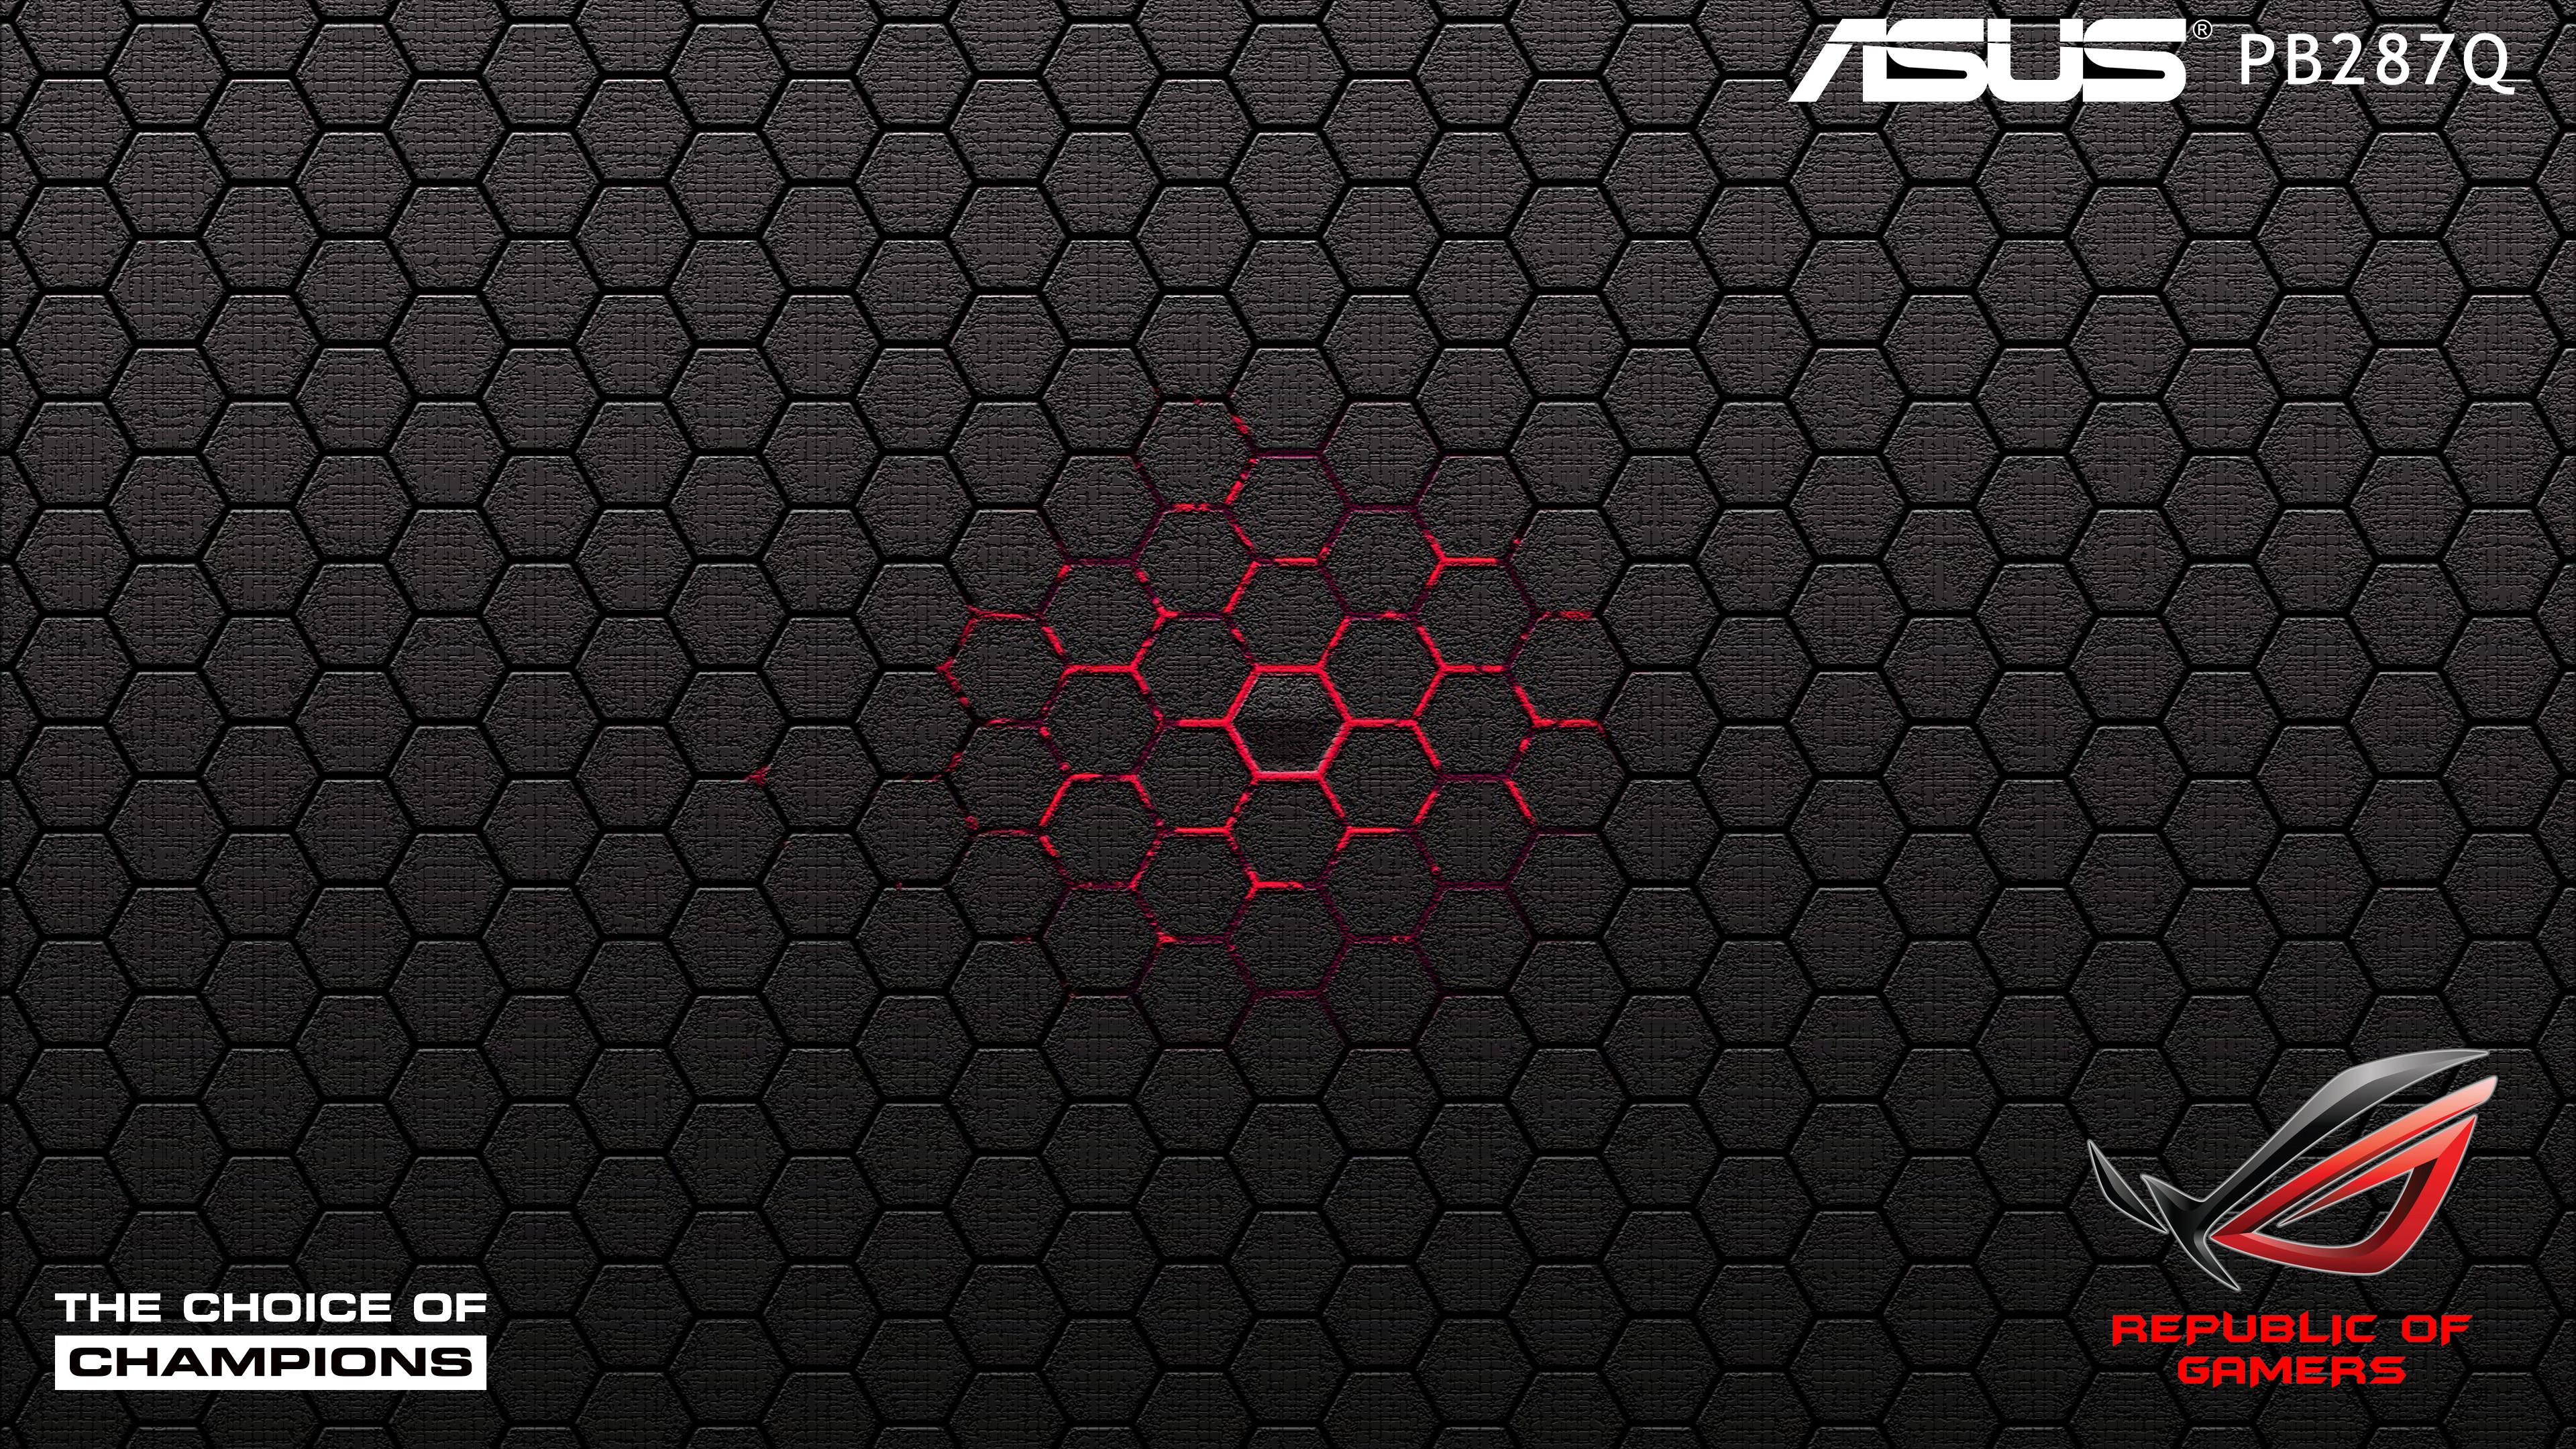 Wallpaper Owl Strix Asus Hd 4k Creative Graphics 10199: ASUS ROG Wallpaper 4K